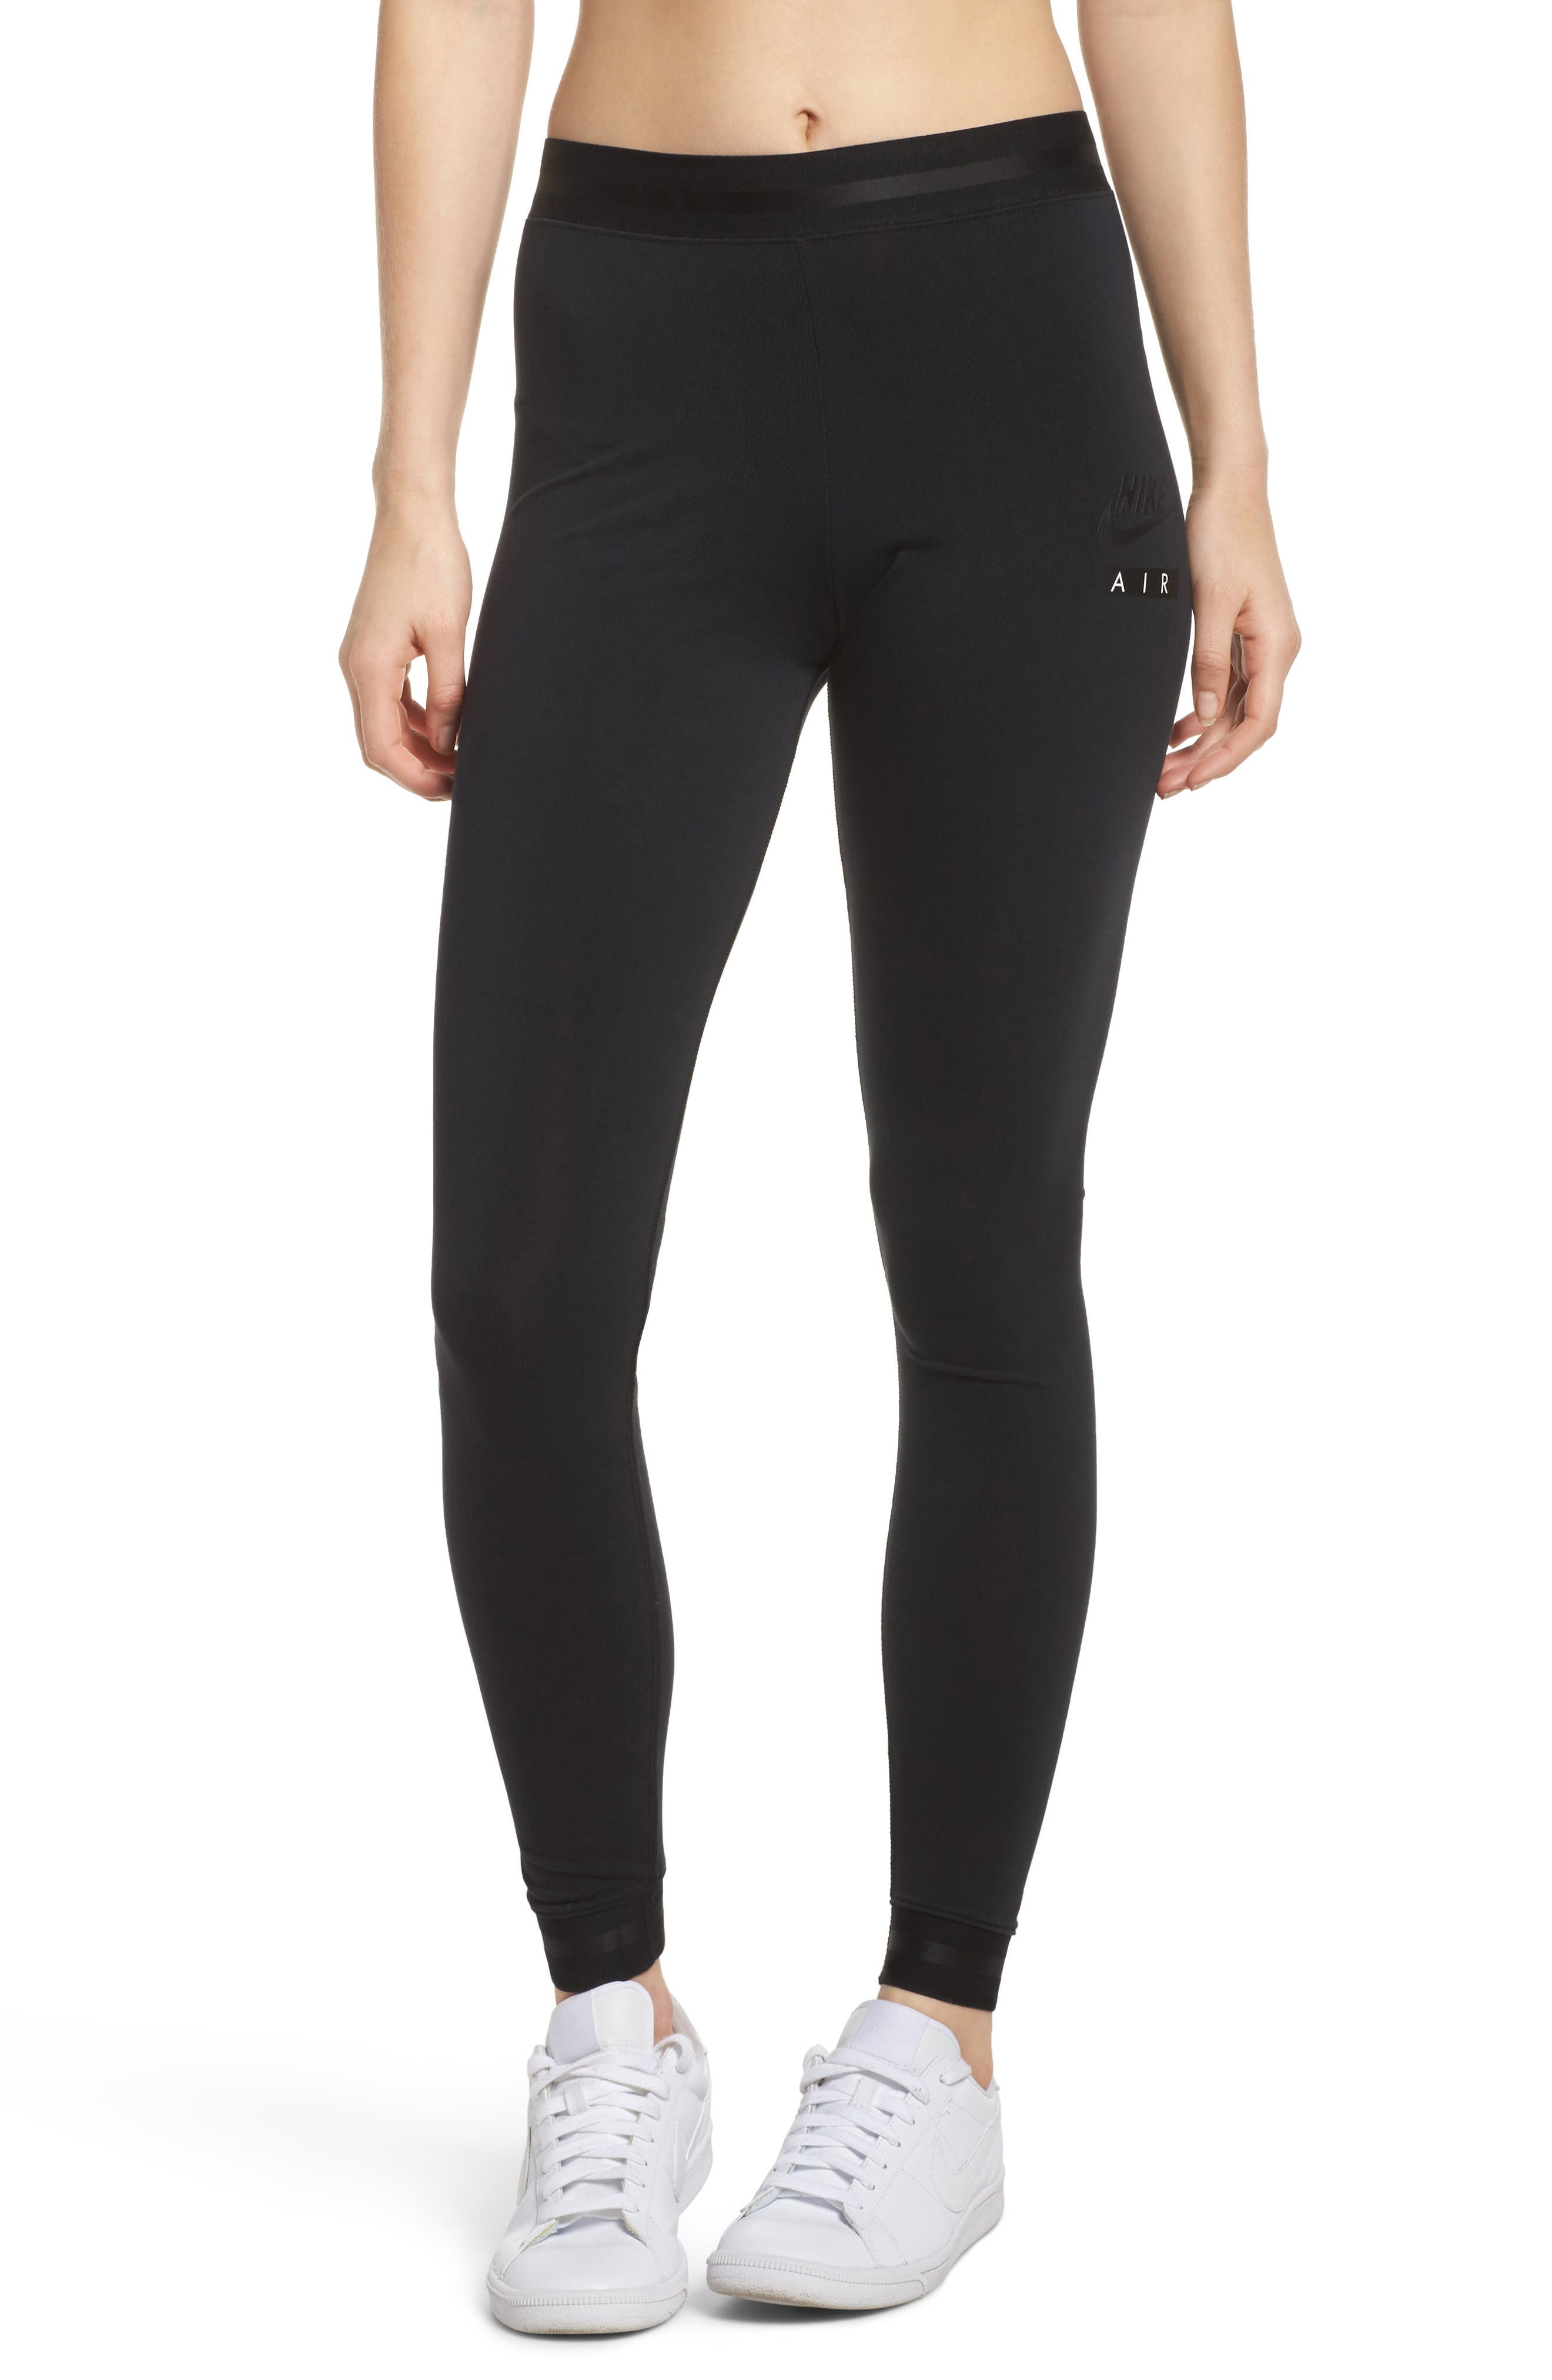 Sportswear Women's Leggings,                         Main,                         color, Black/ Black/ Black